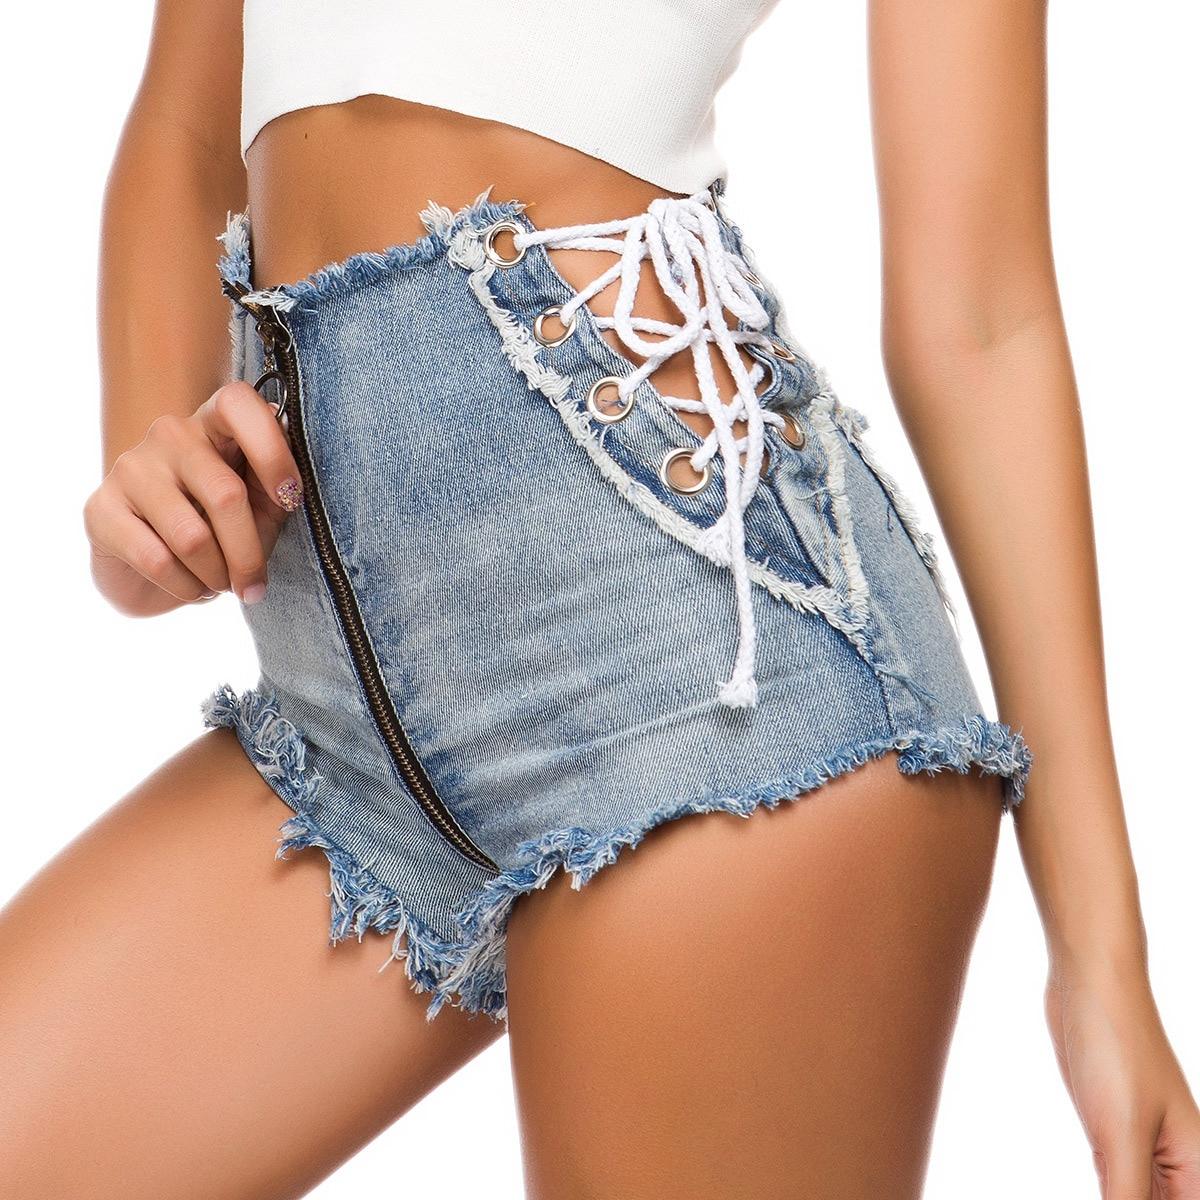 Lace Up Sexy Shorts 2019 Summer Women Ripped Denim Short Zipper Back Sexy High Waist Jean Shorts Chores Cortos Mujer DK091S30